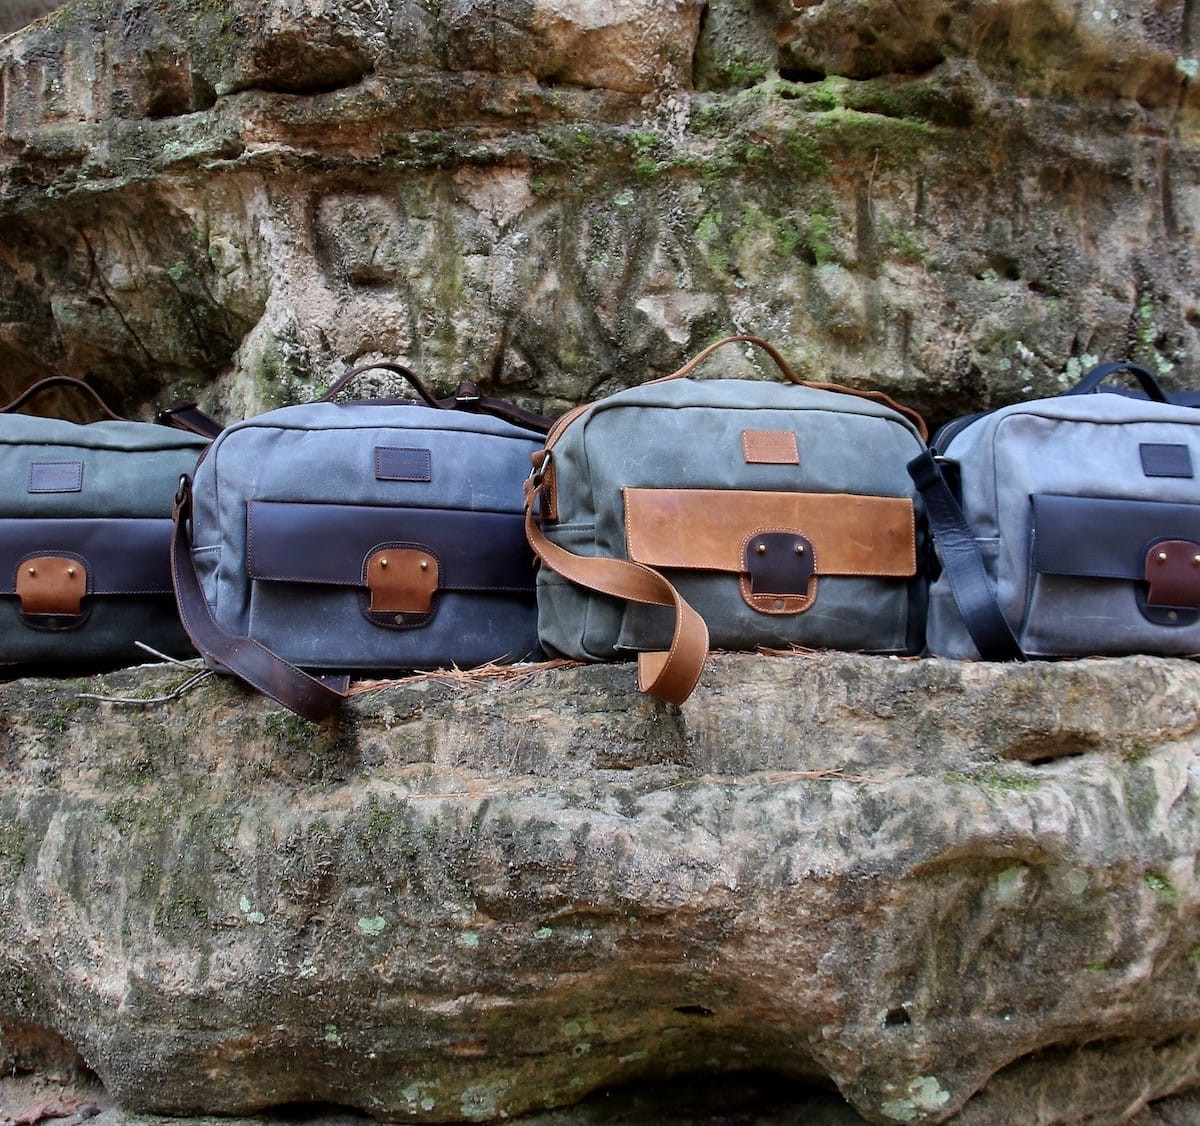 William Ross Weatherproof Travel Bag has a unisex, airplane-friendly design